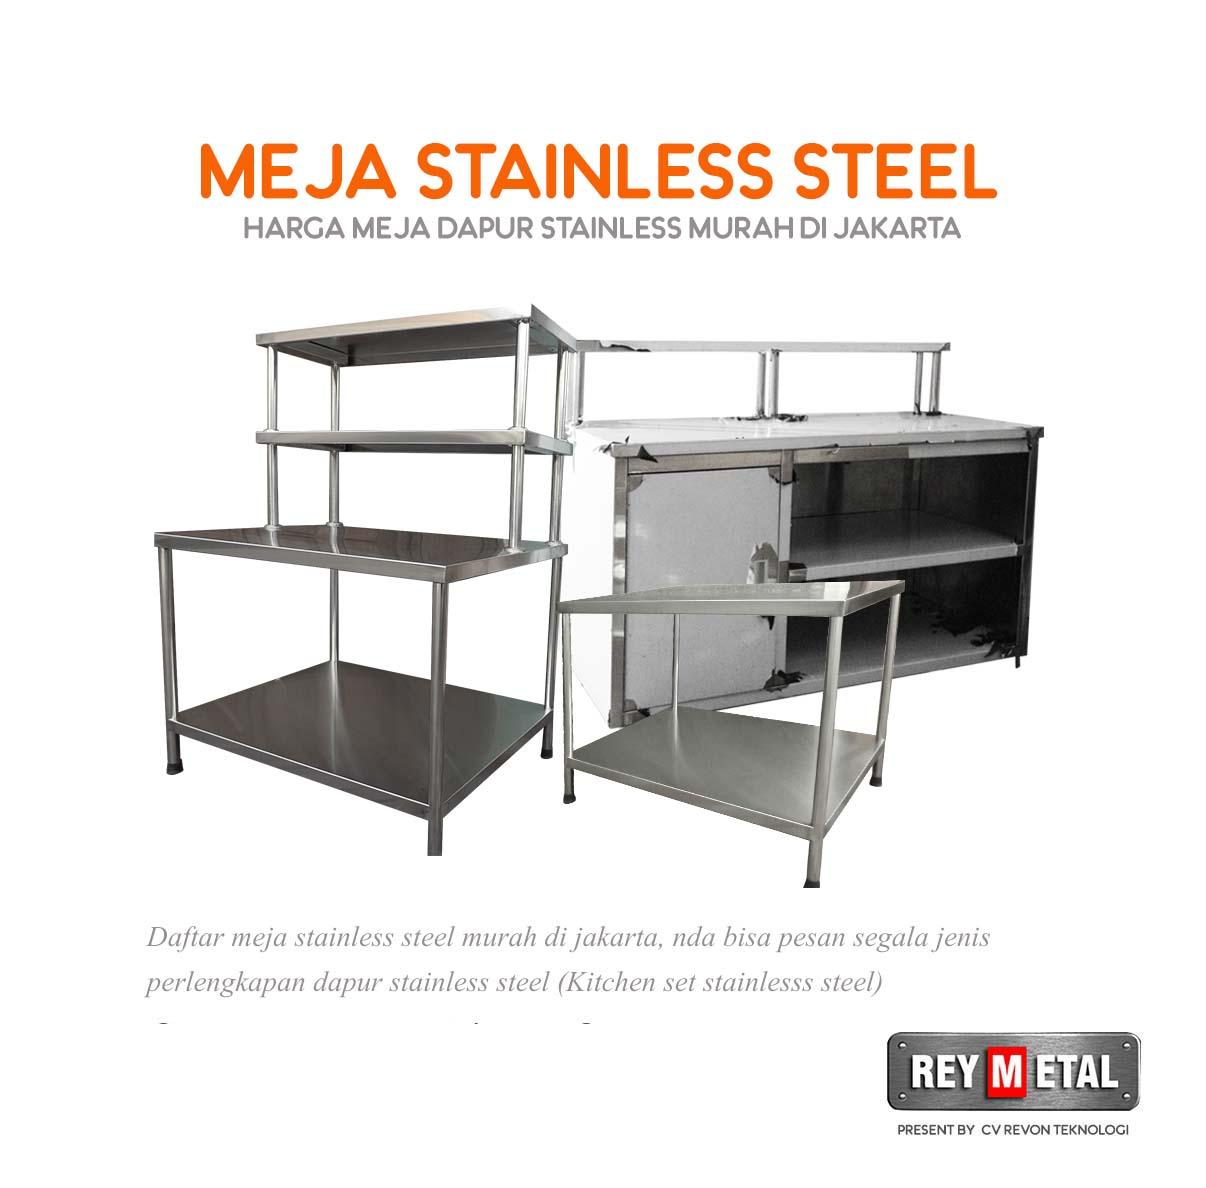 Dapur Stainless Steel Murah